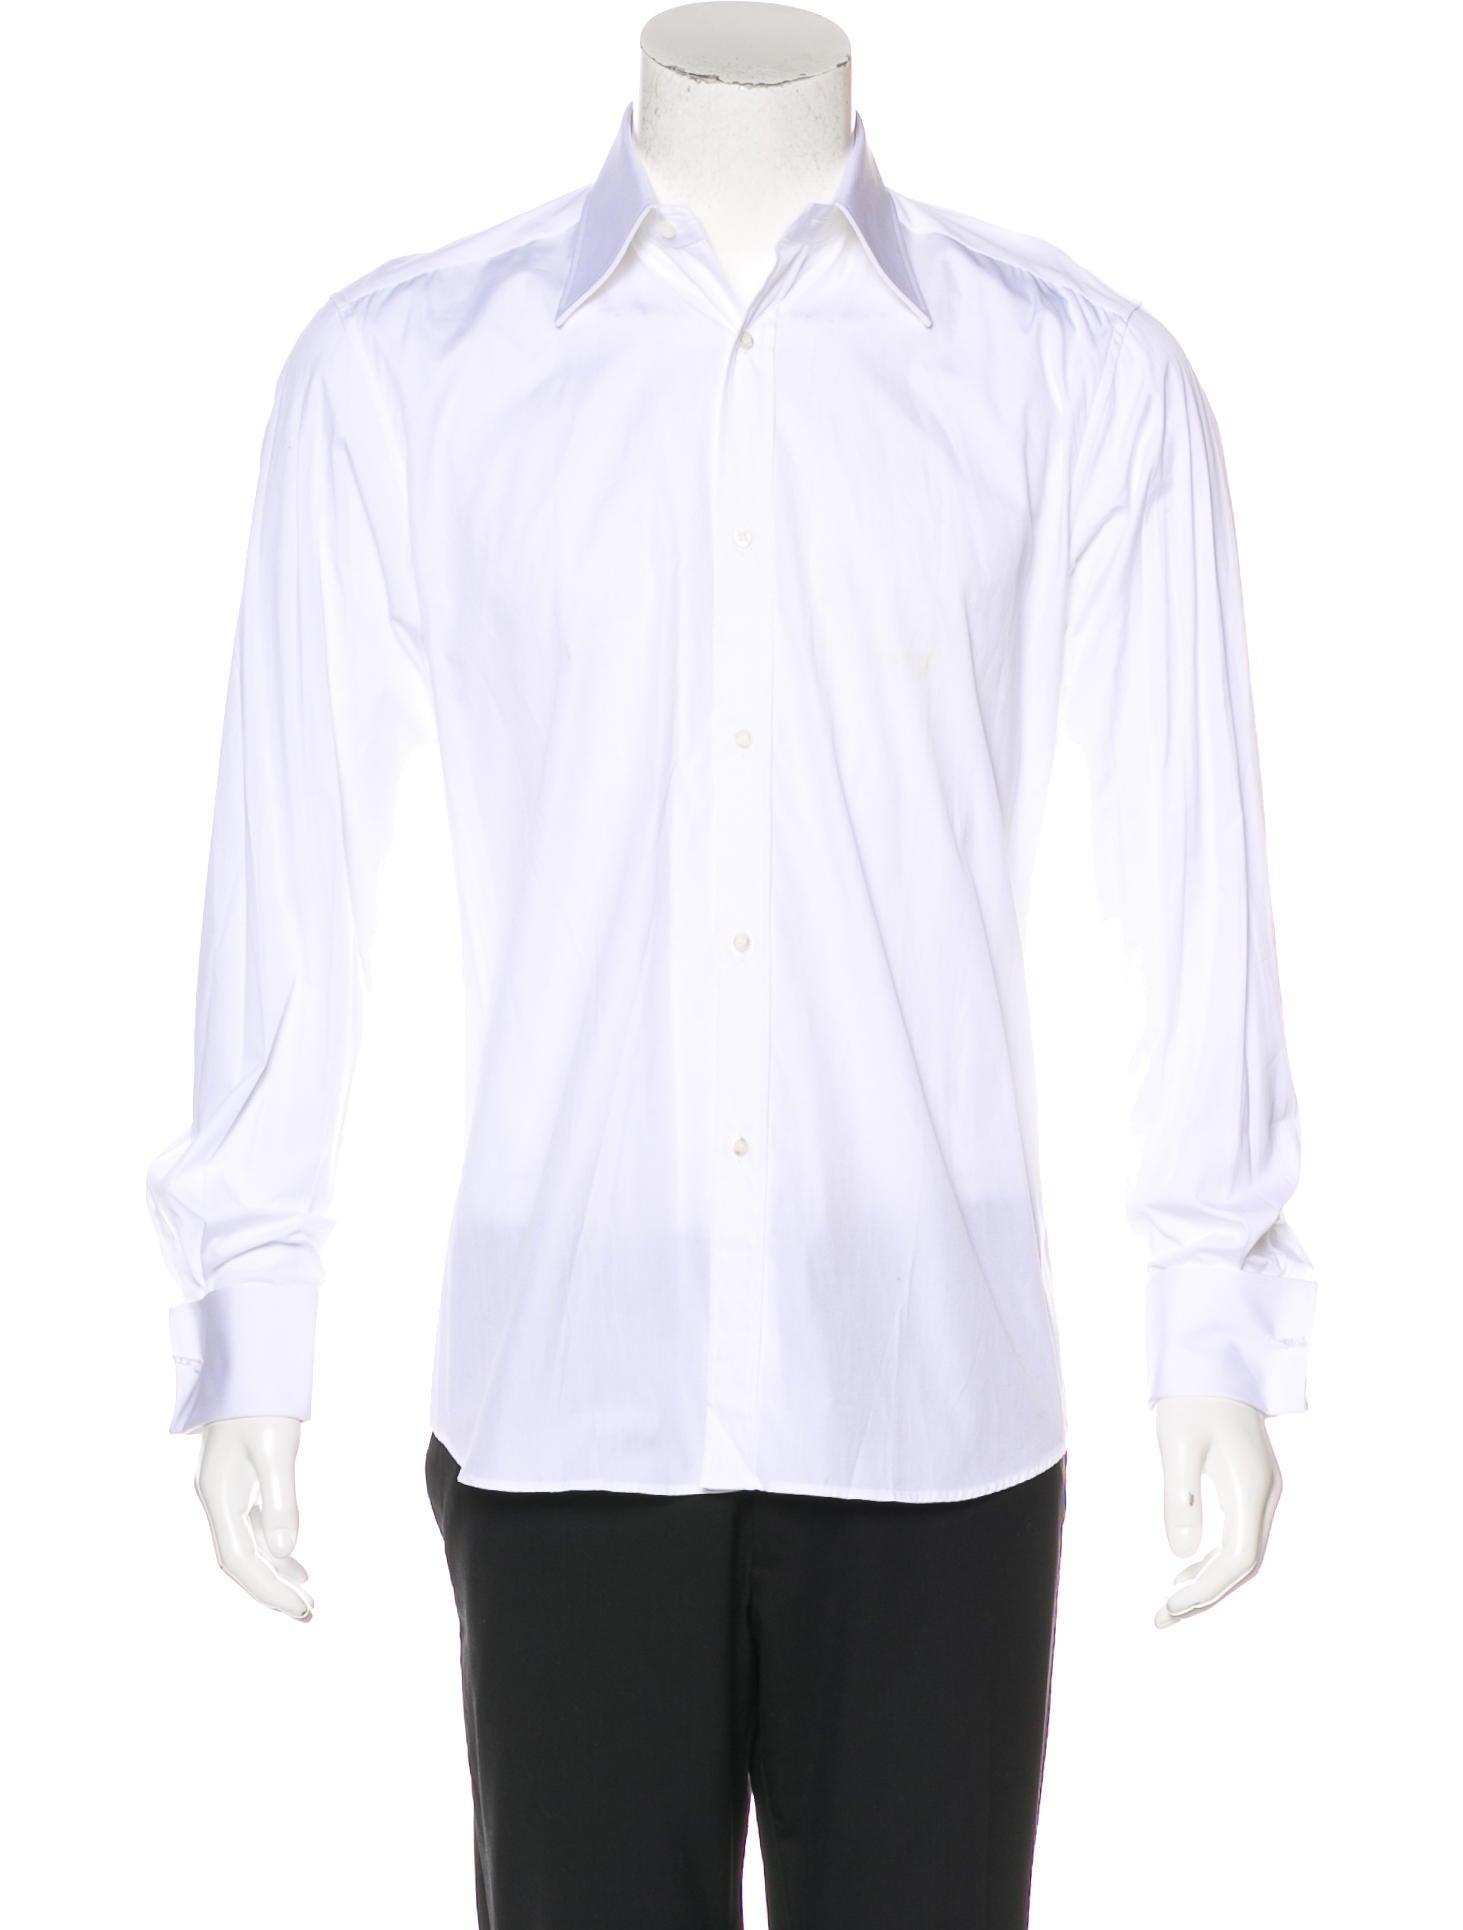 Gucci french cuff dress shirt w tags clothing for Dress shirt french cuffs